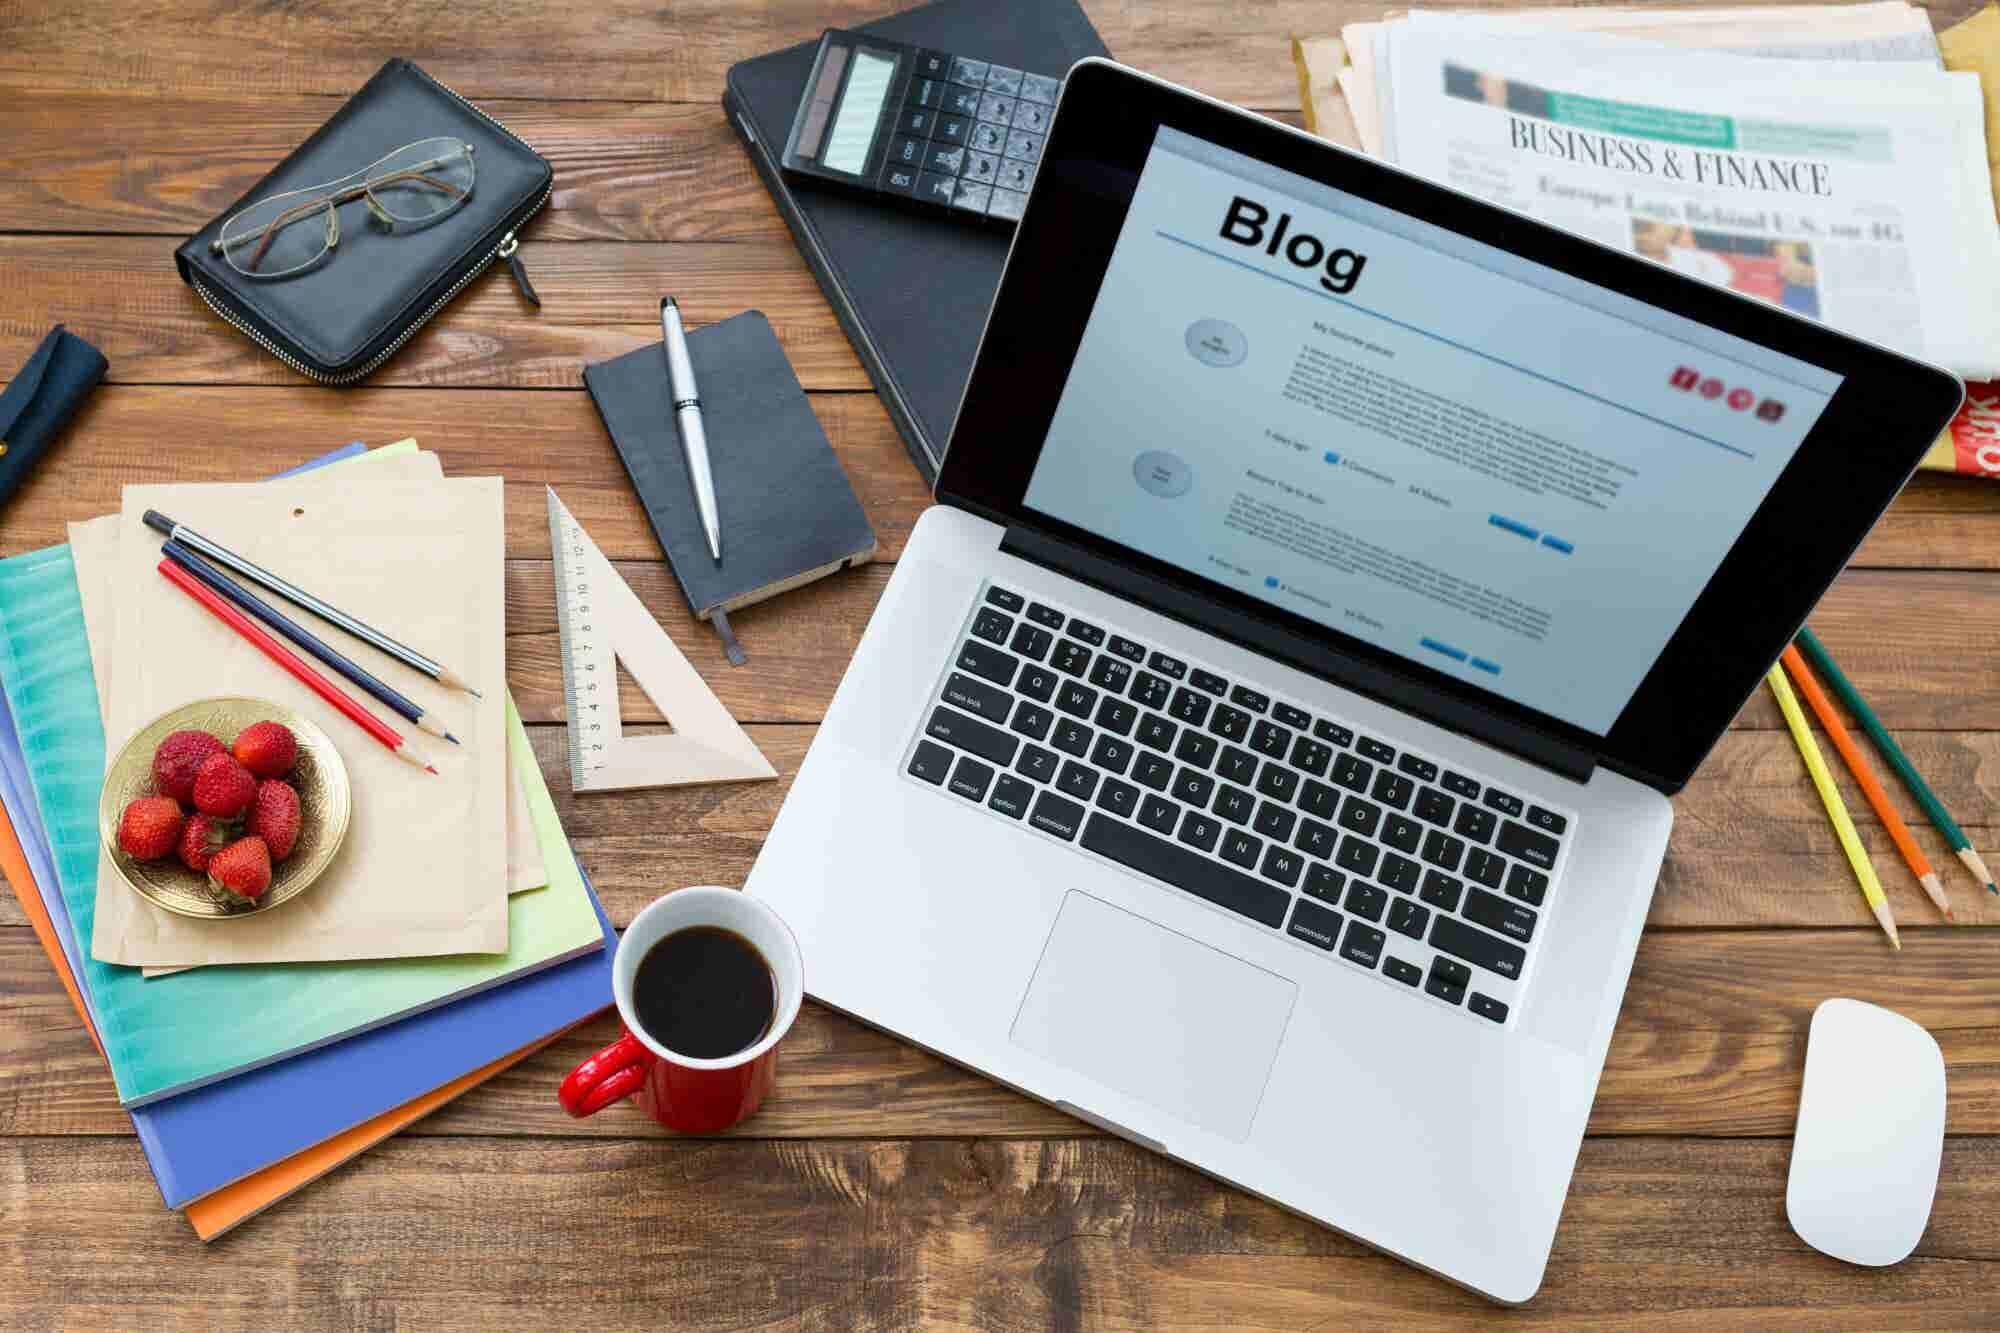 5 tipos de contenidos que deberías publicar en tu blog